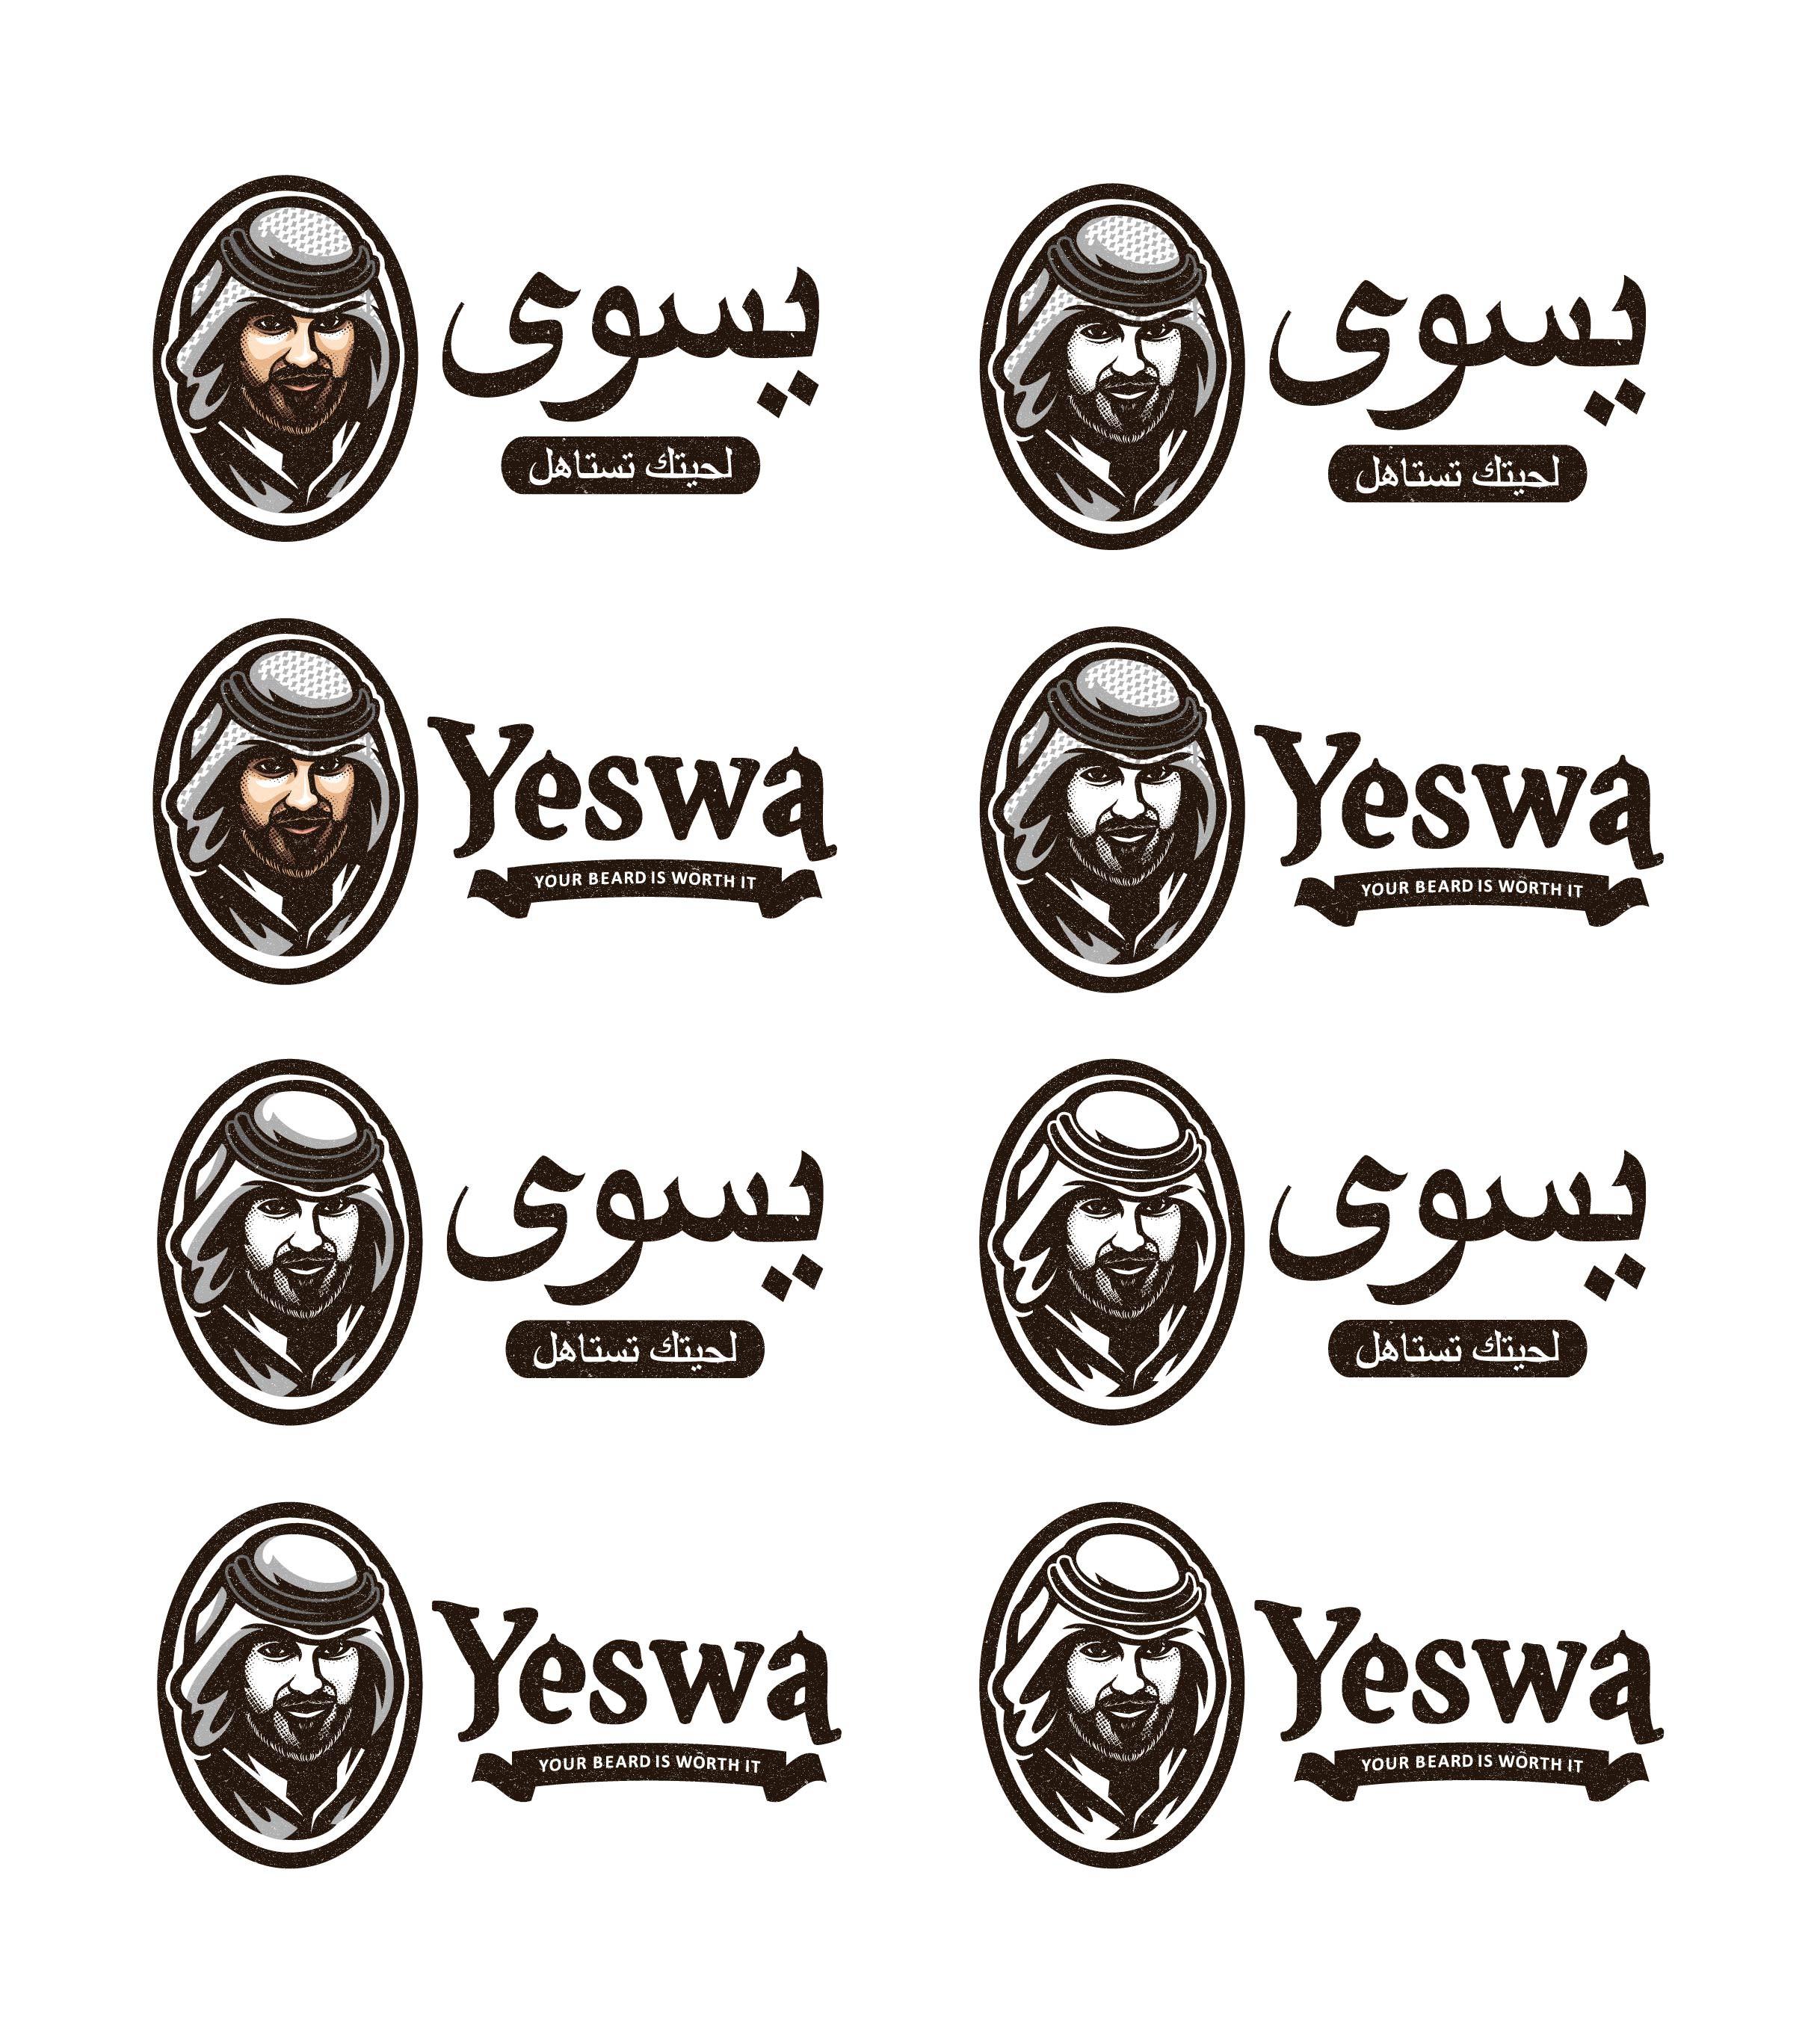 Arabian beard oil